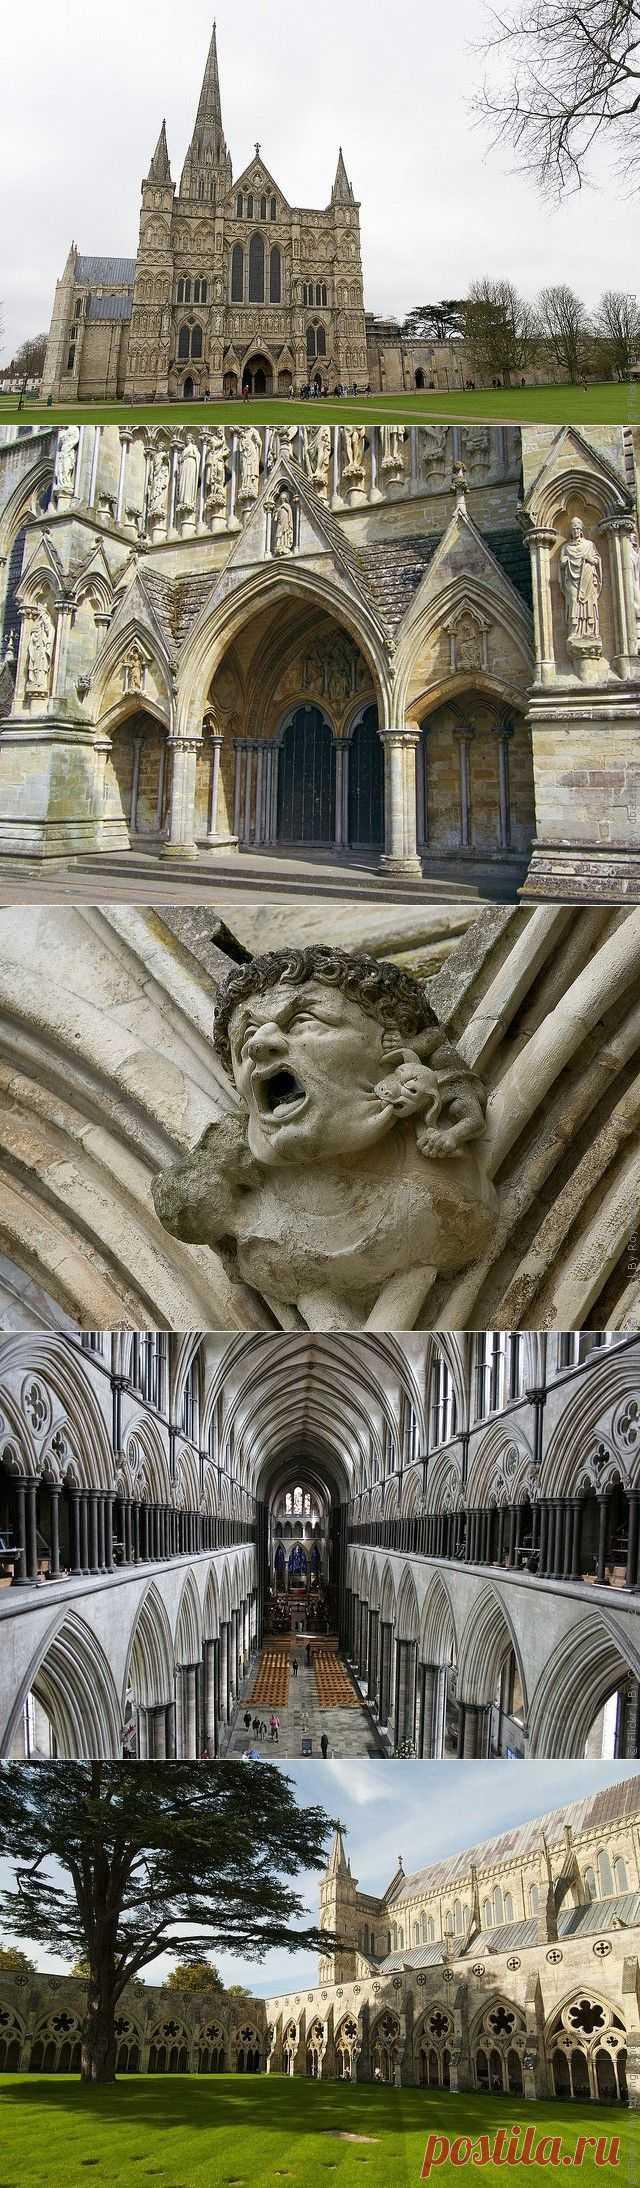 Солсберийский собор в Англии, фото и история собора